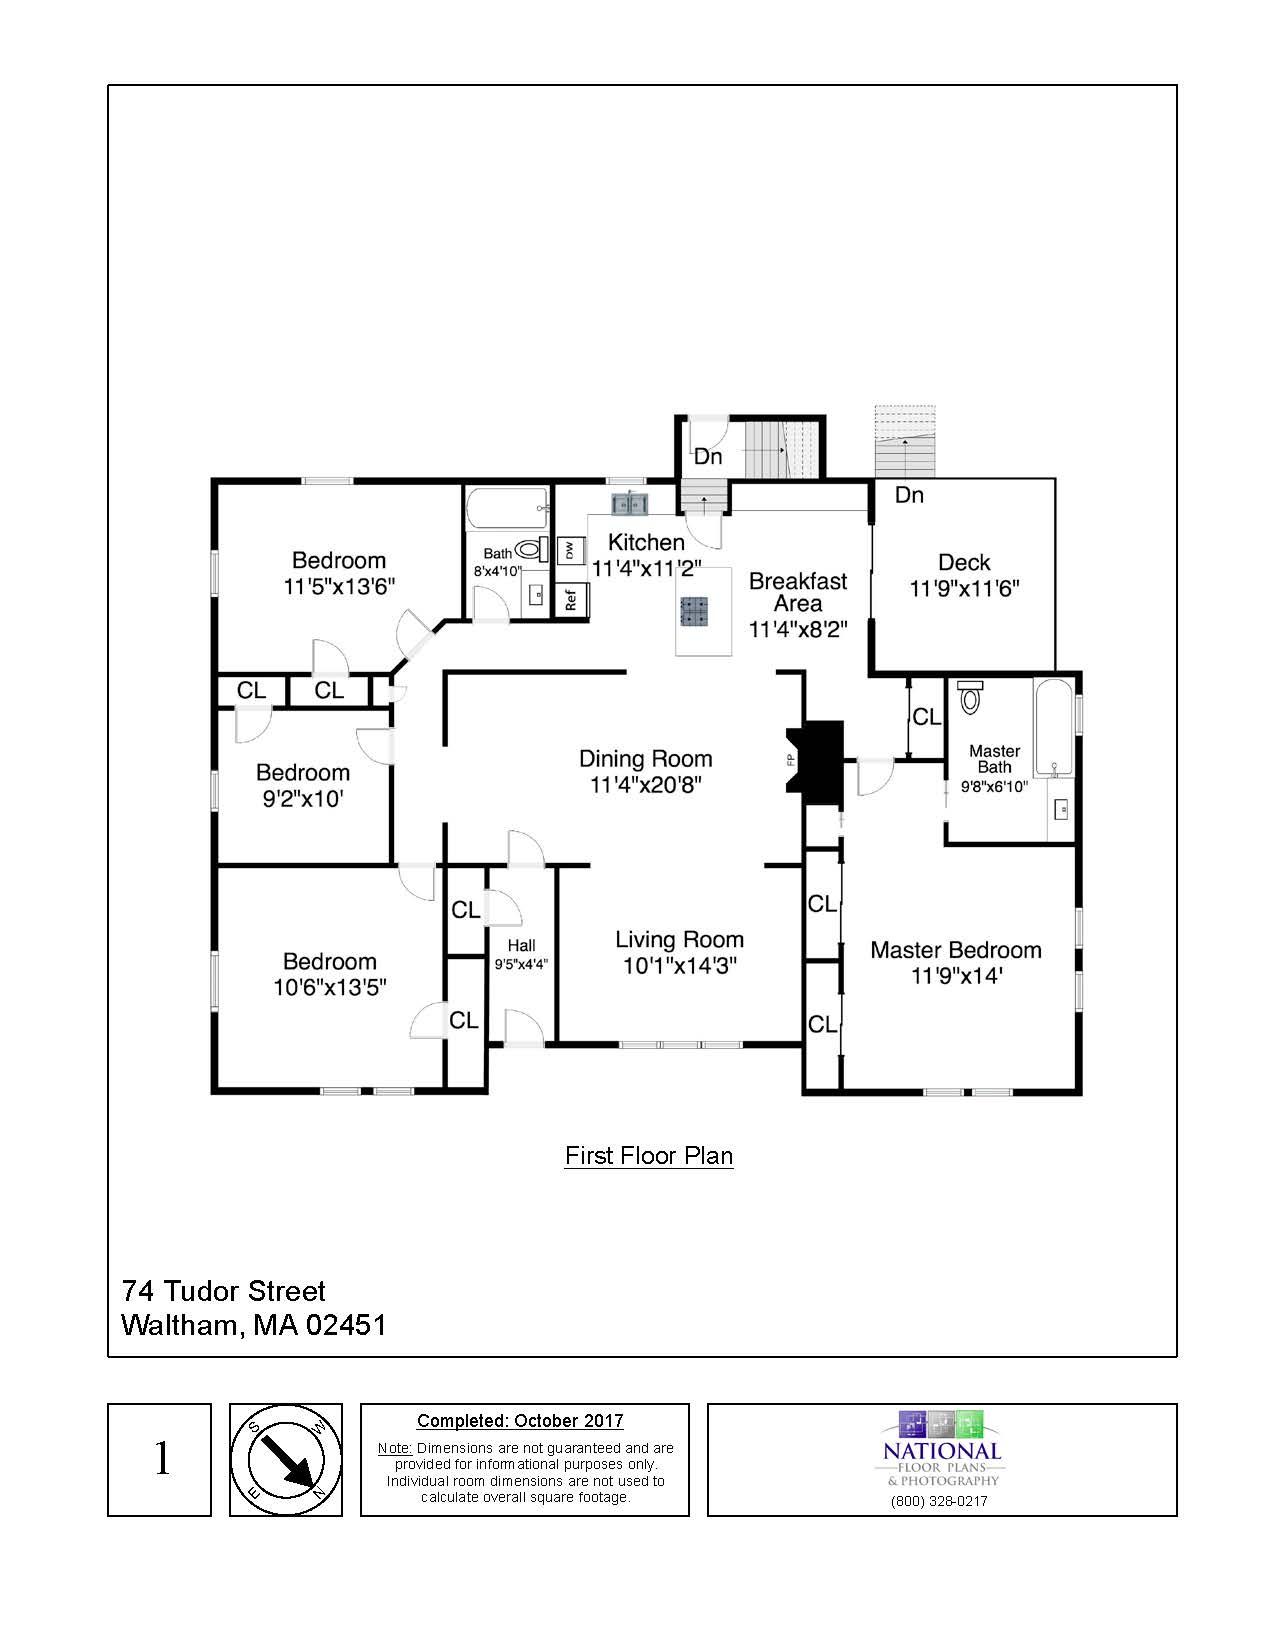 74 Tudor Street, Waltham - First Floor Floor Plan